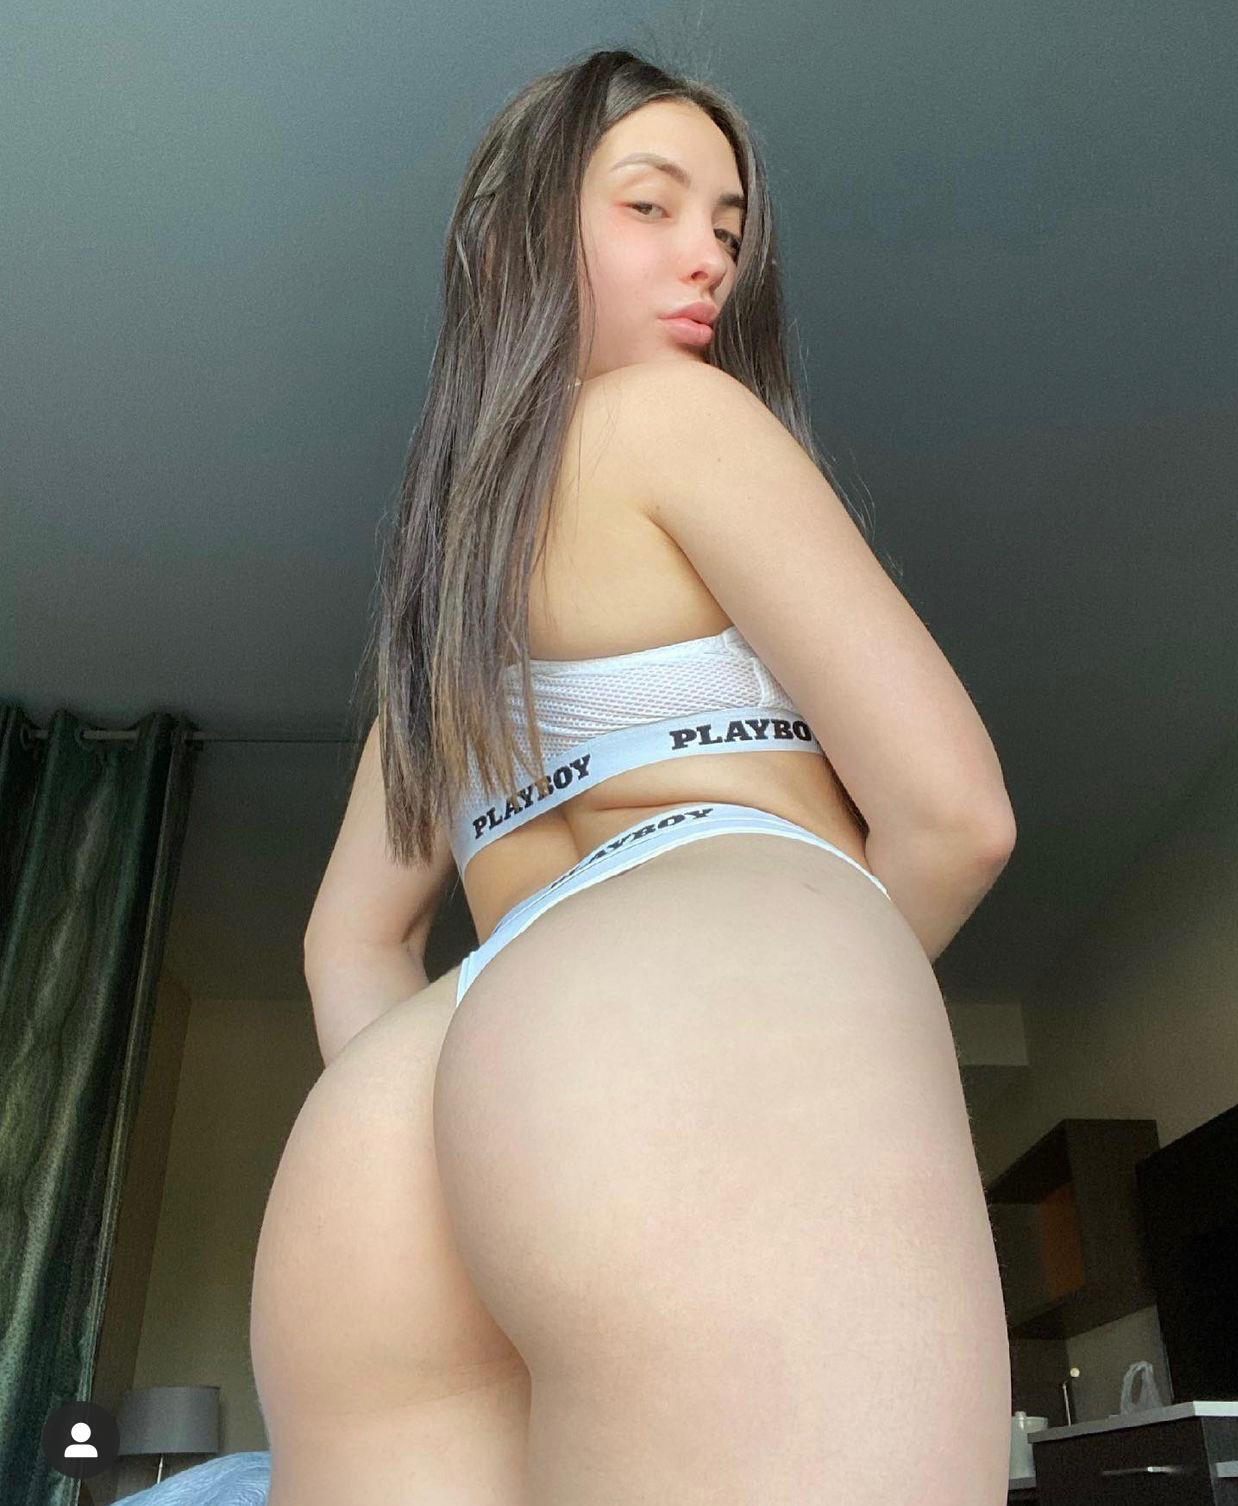 100% REAL💕✨PRETTY WET GIRl READY TO FUCK whatsapp +1 (805)475-3242